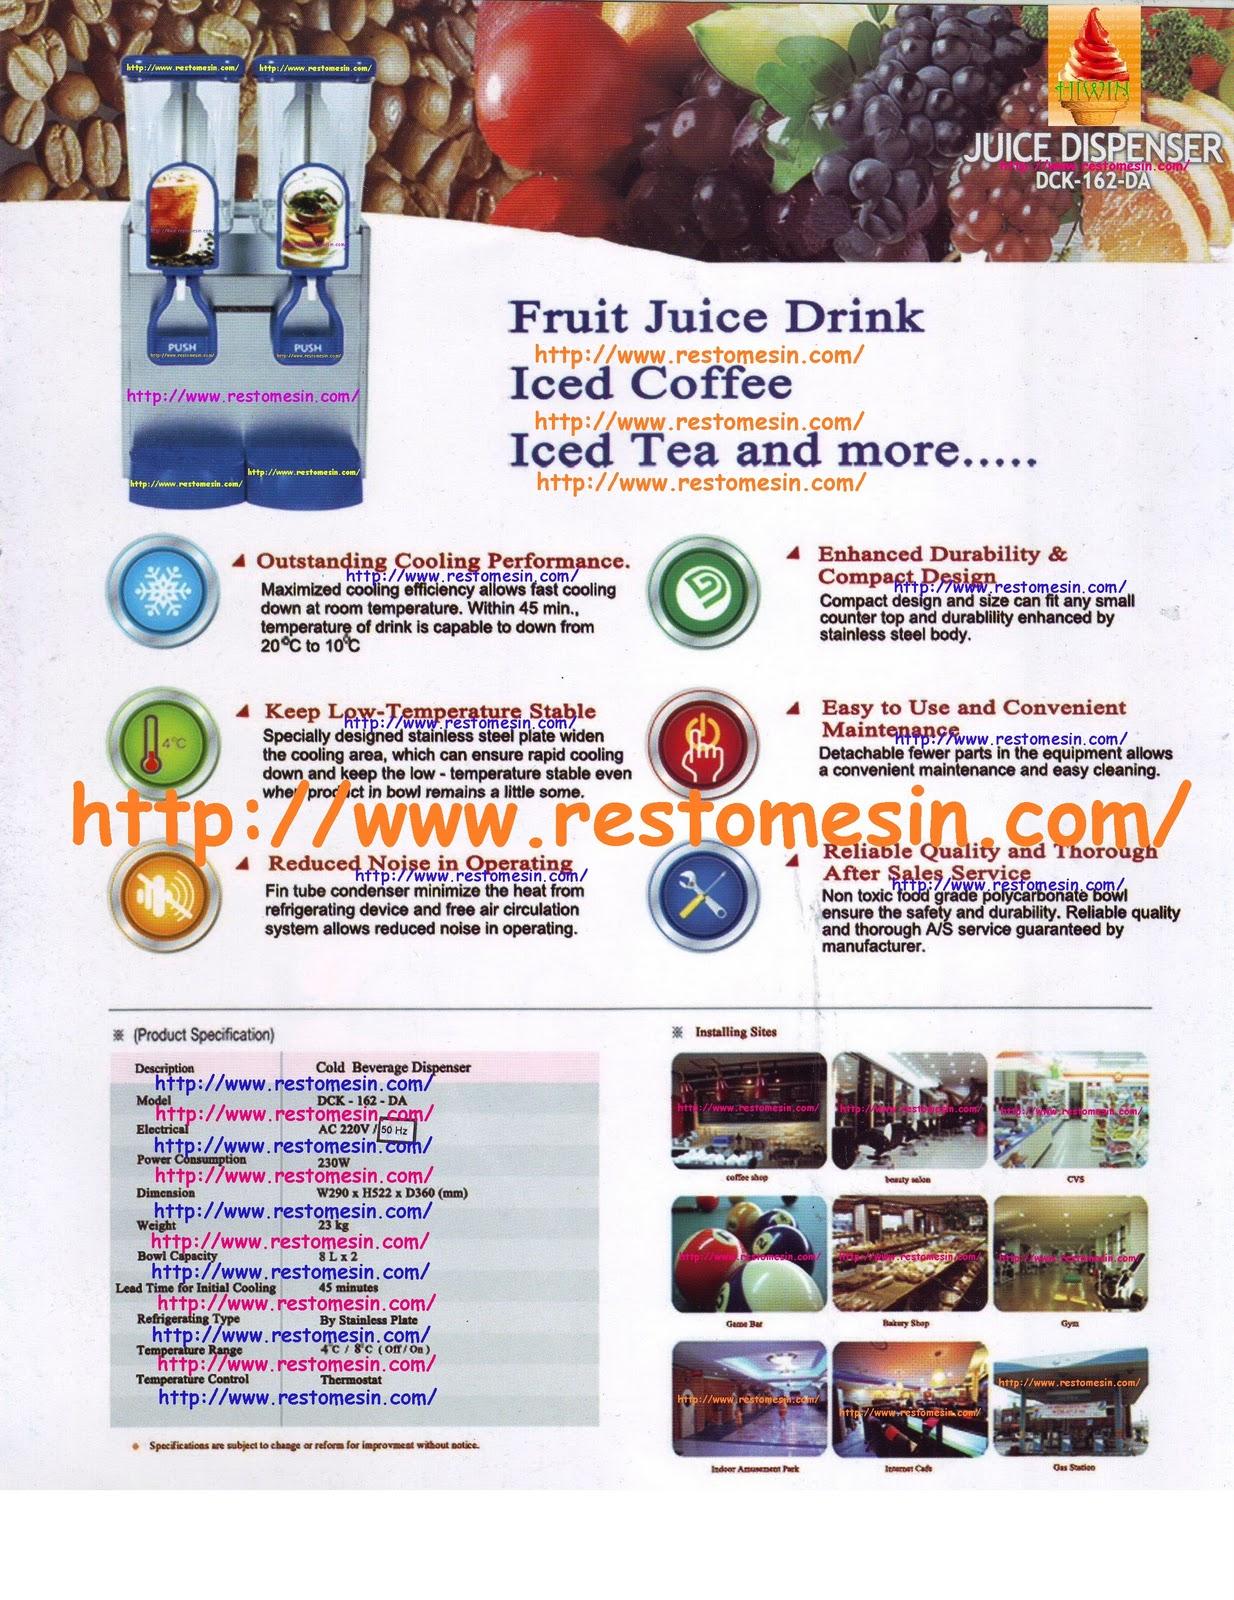 Juice Dispenser DCK 162 DA Mesin Pendingin Minuman Atau